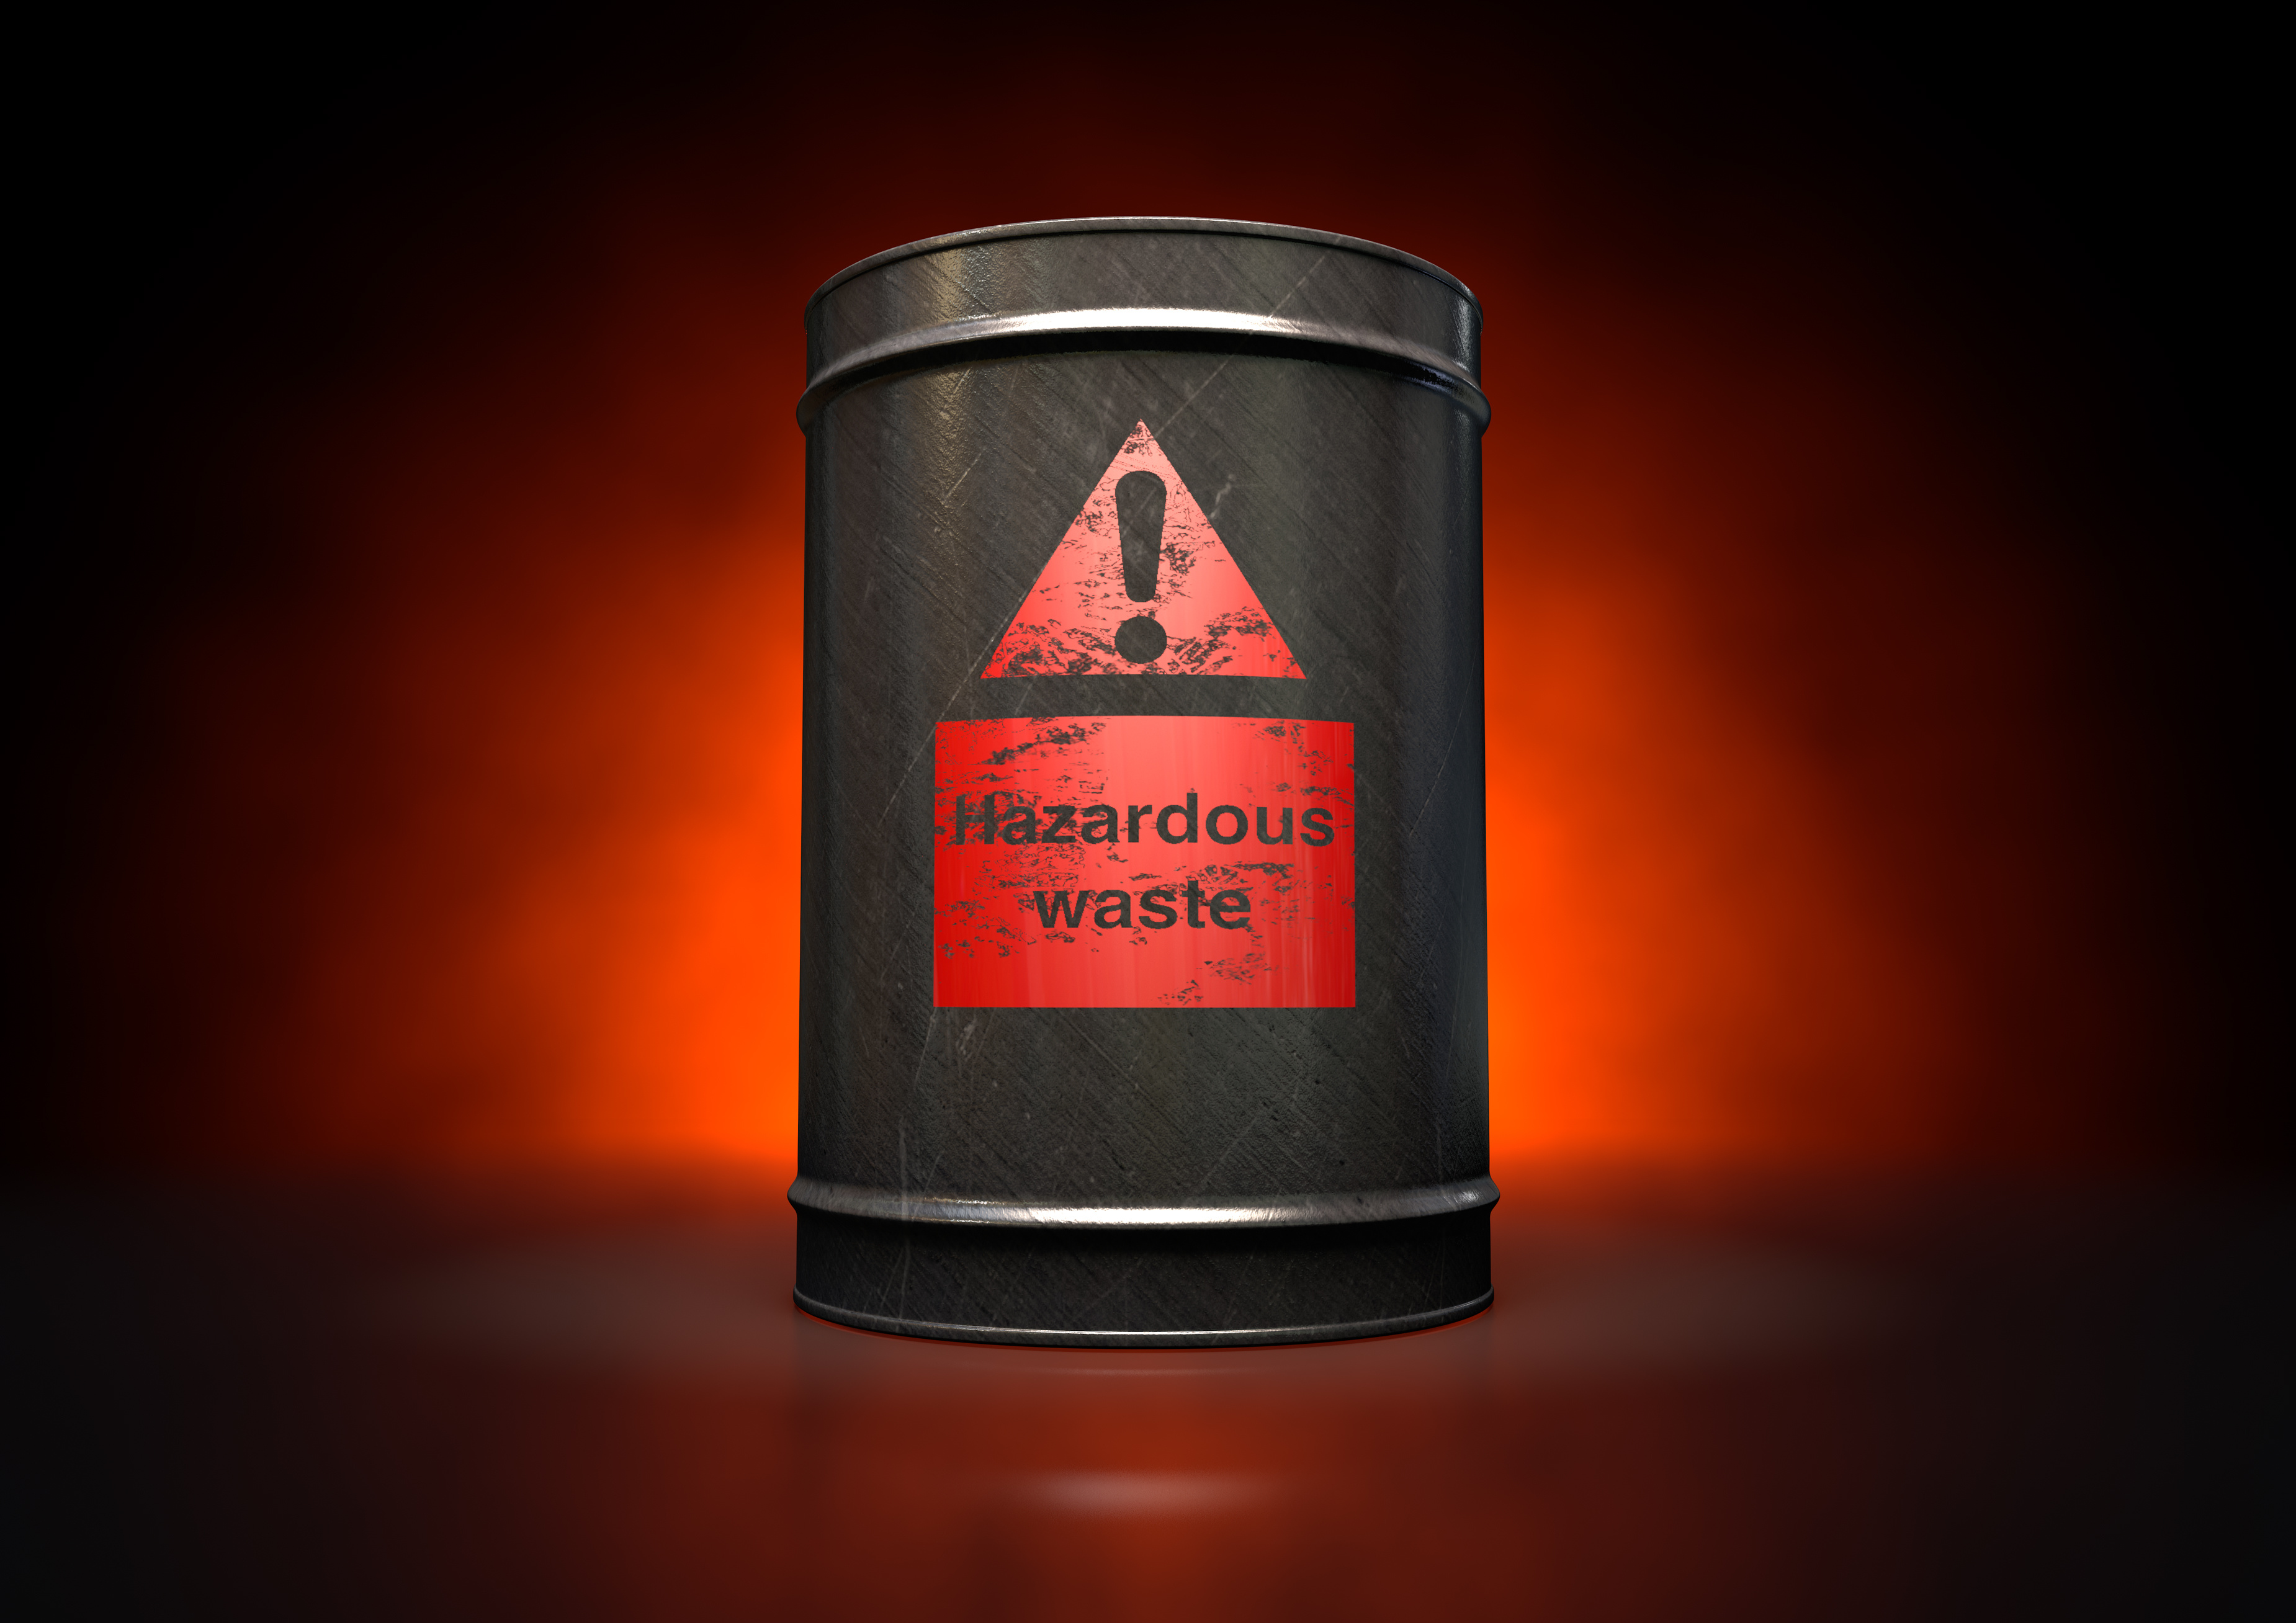 Hazardous Waste Image